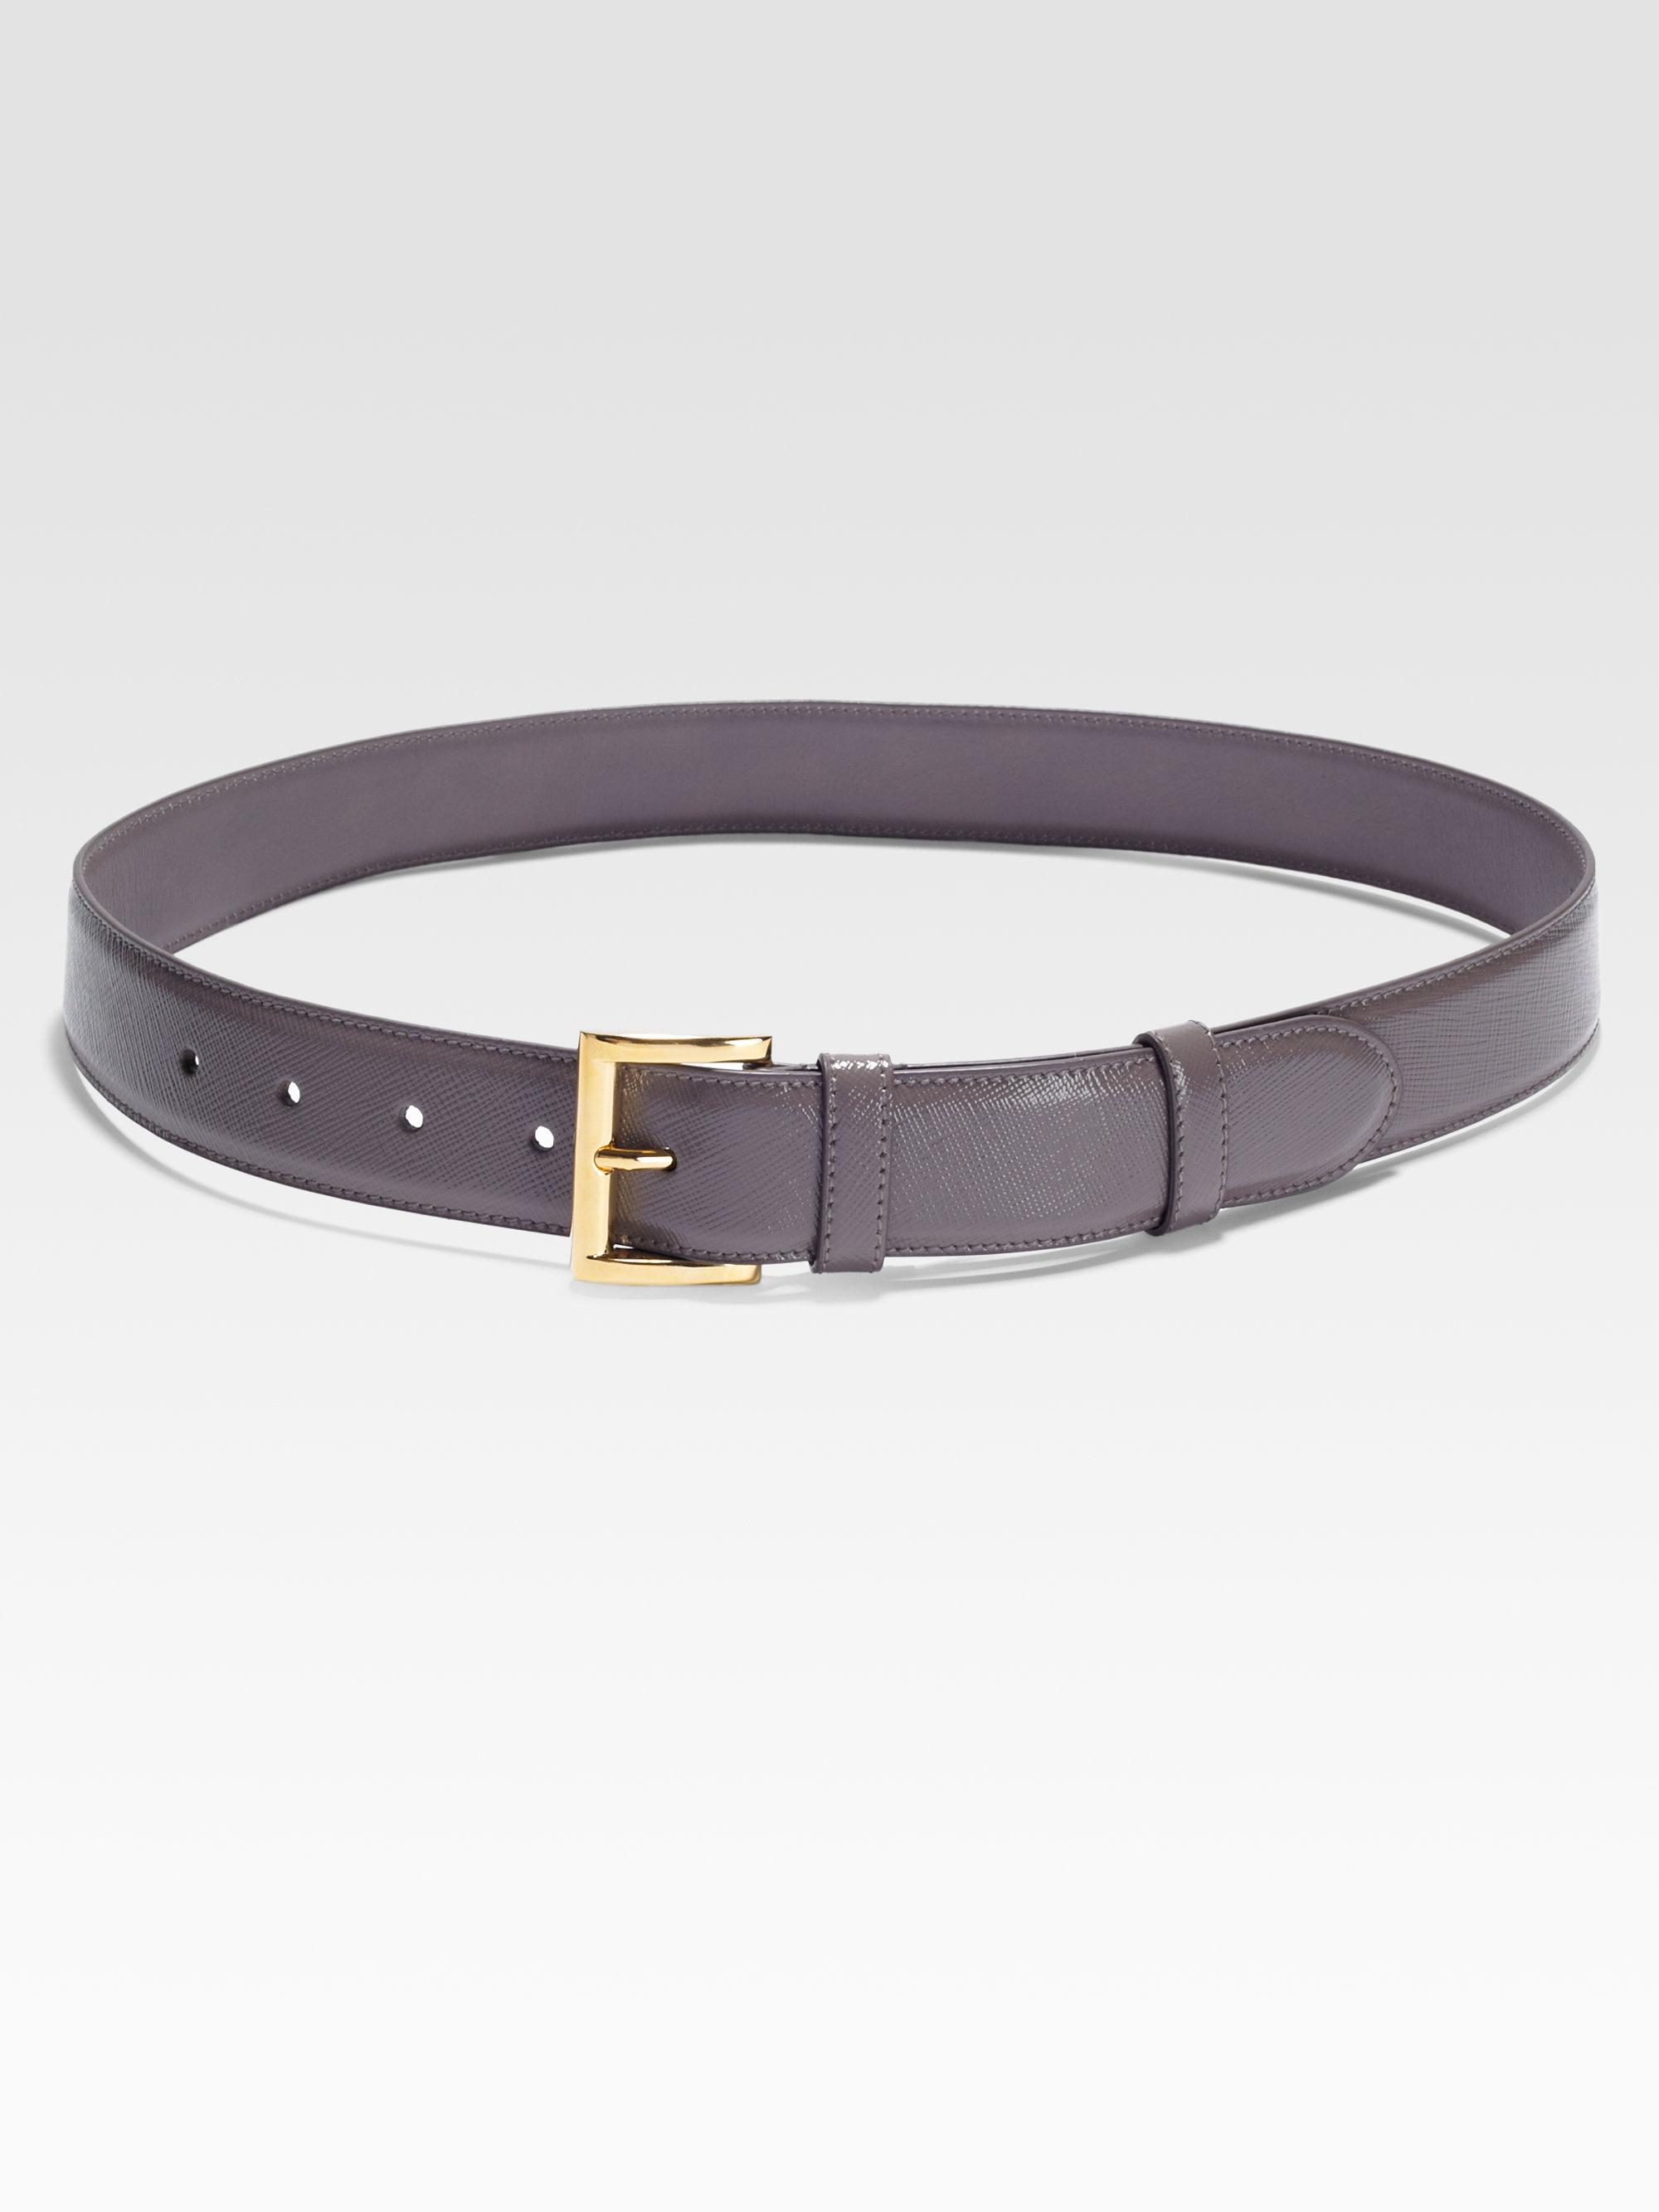 Prada Vernice Saffiano Leather Belt in Gray (grey) | Lyst